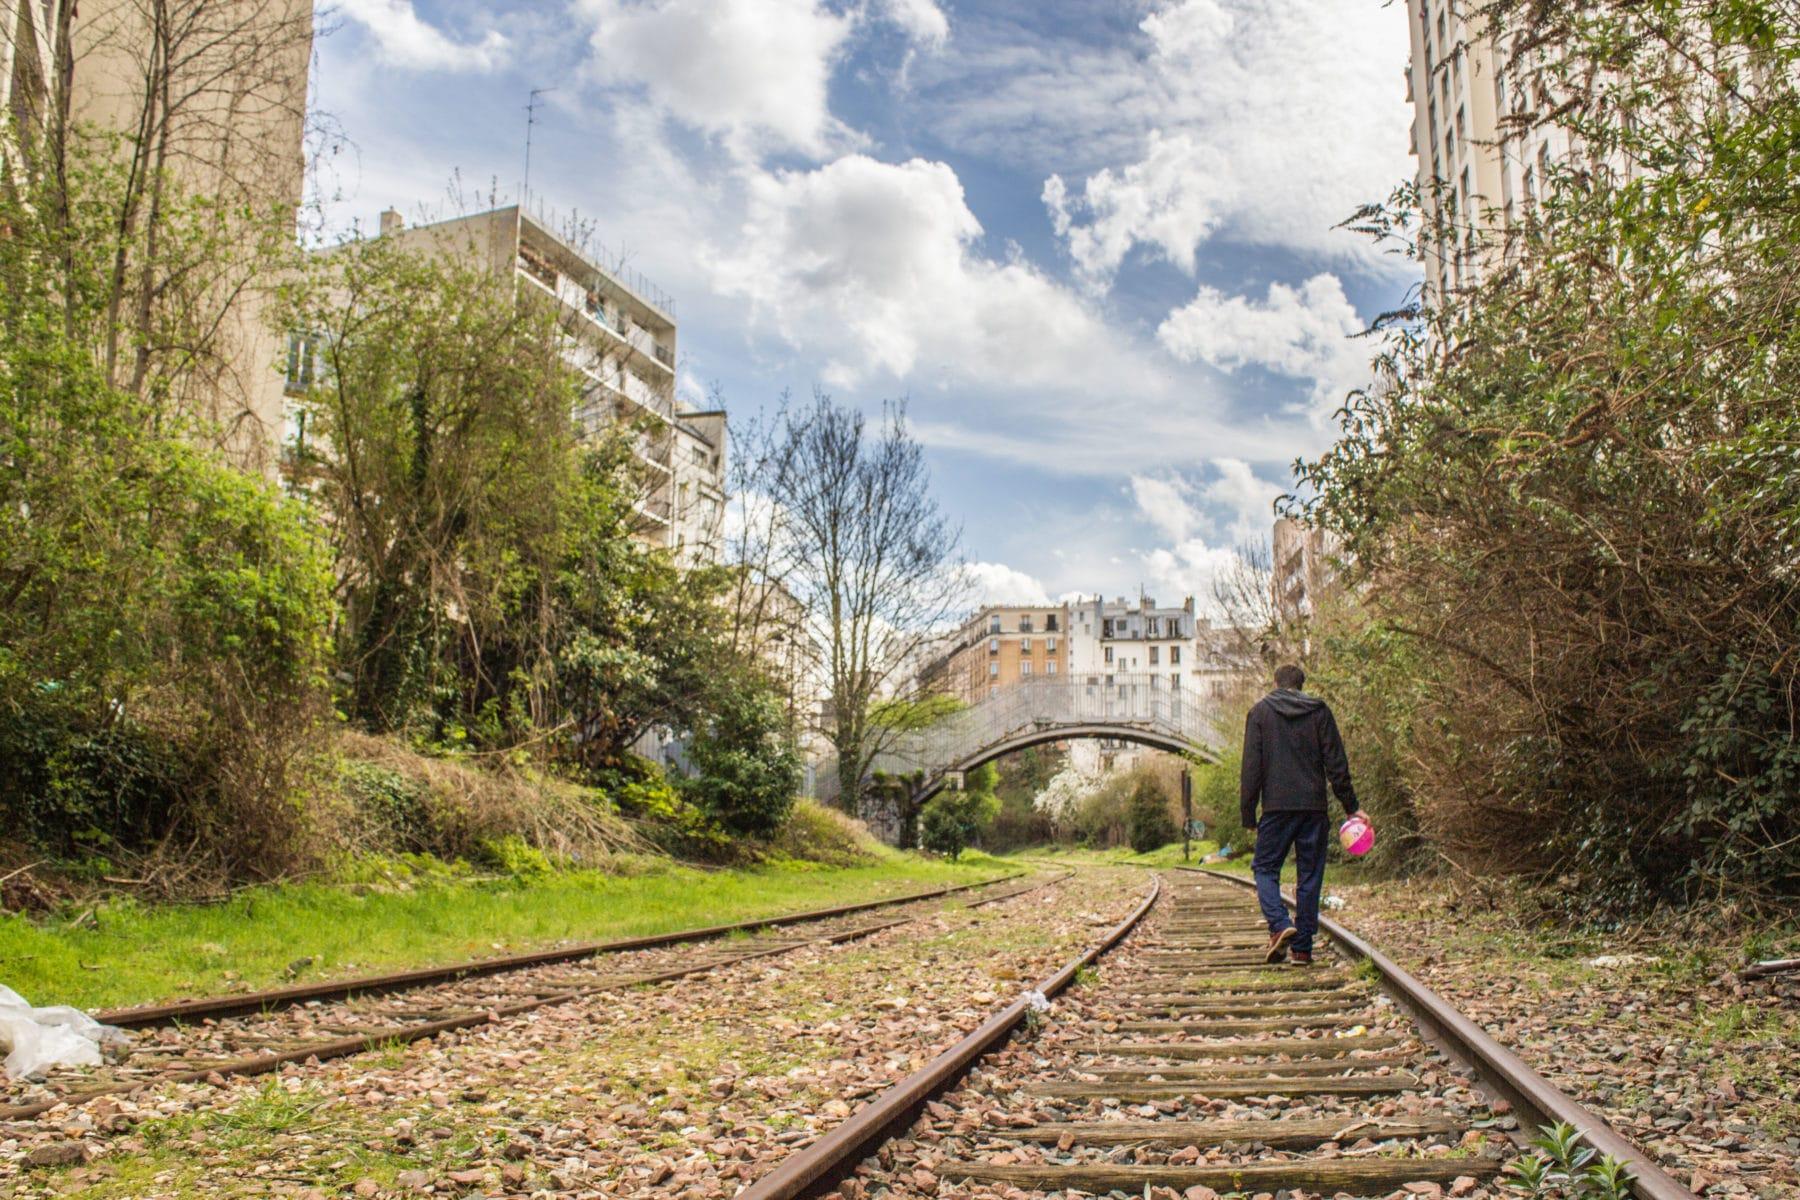 La Petite Ceinture, Paris